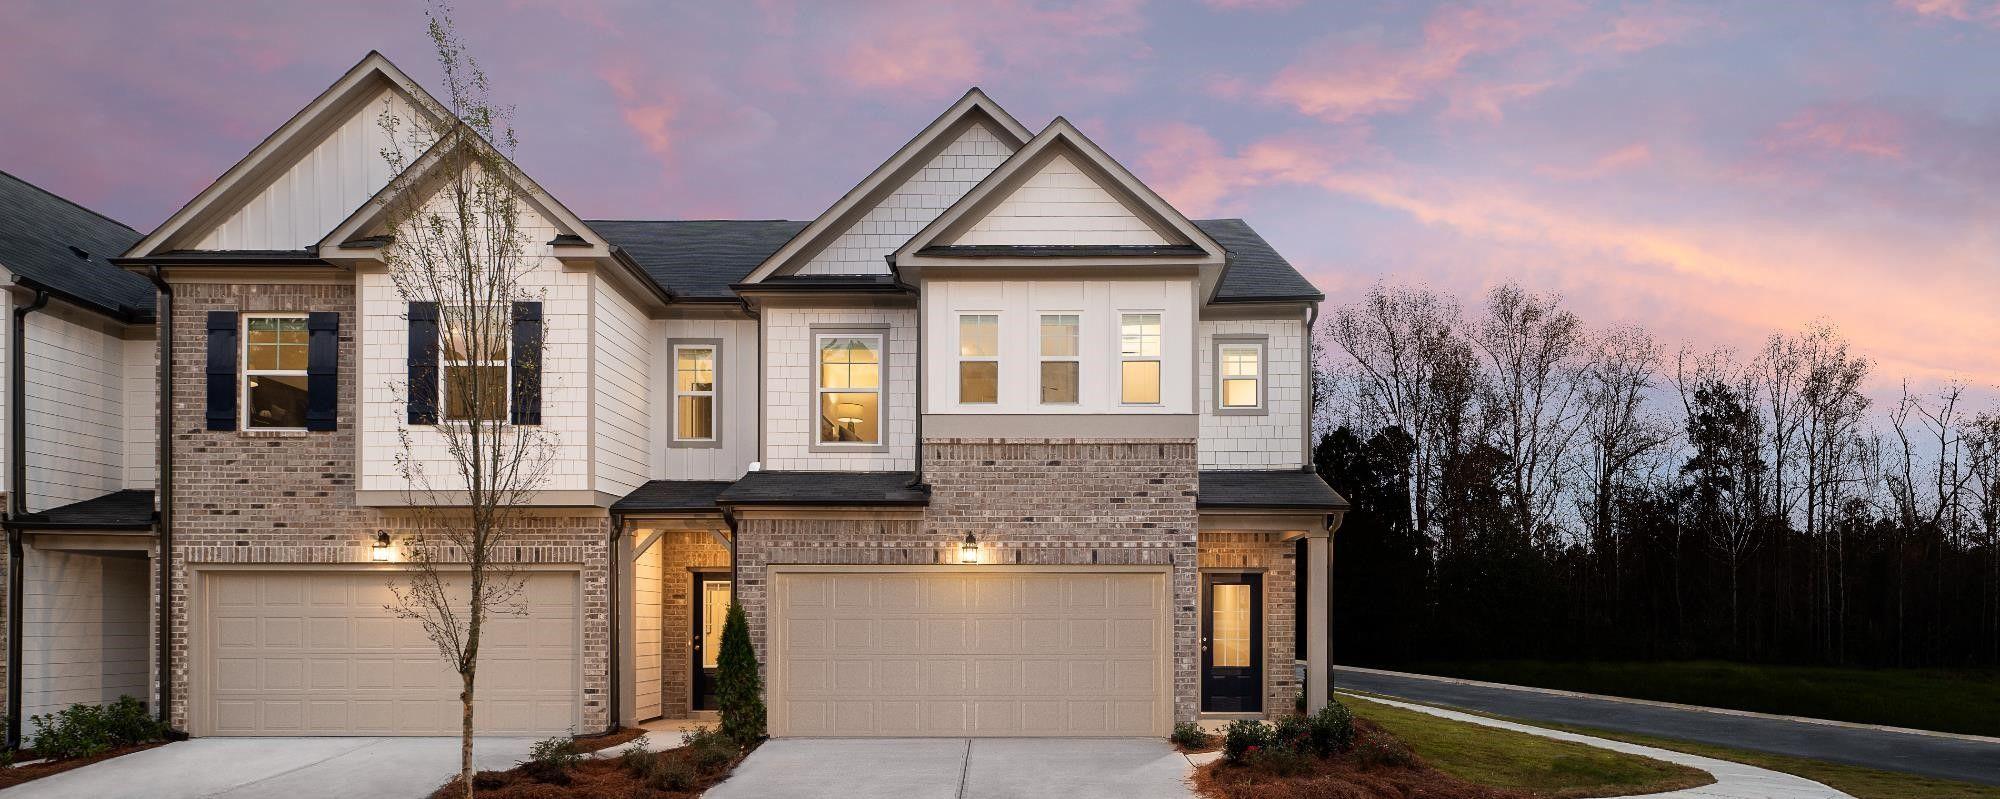 'Cooper Springs' by Ashton Woods Homes-Atlanta in Atlanta